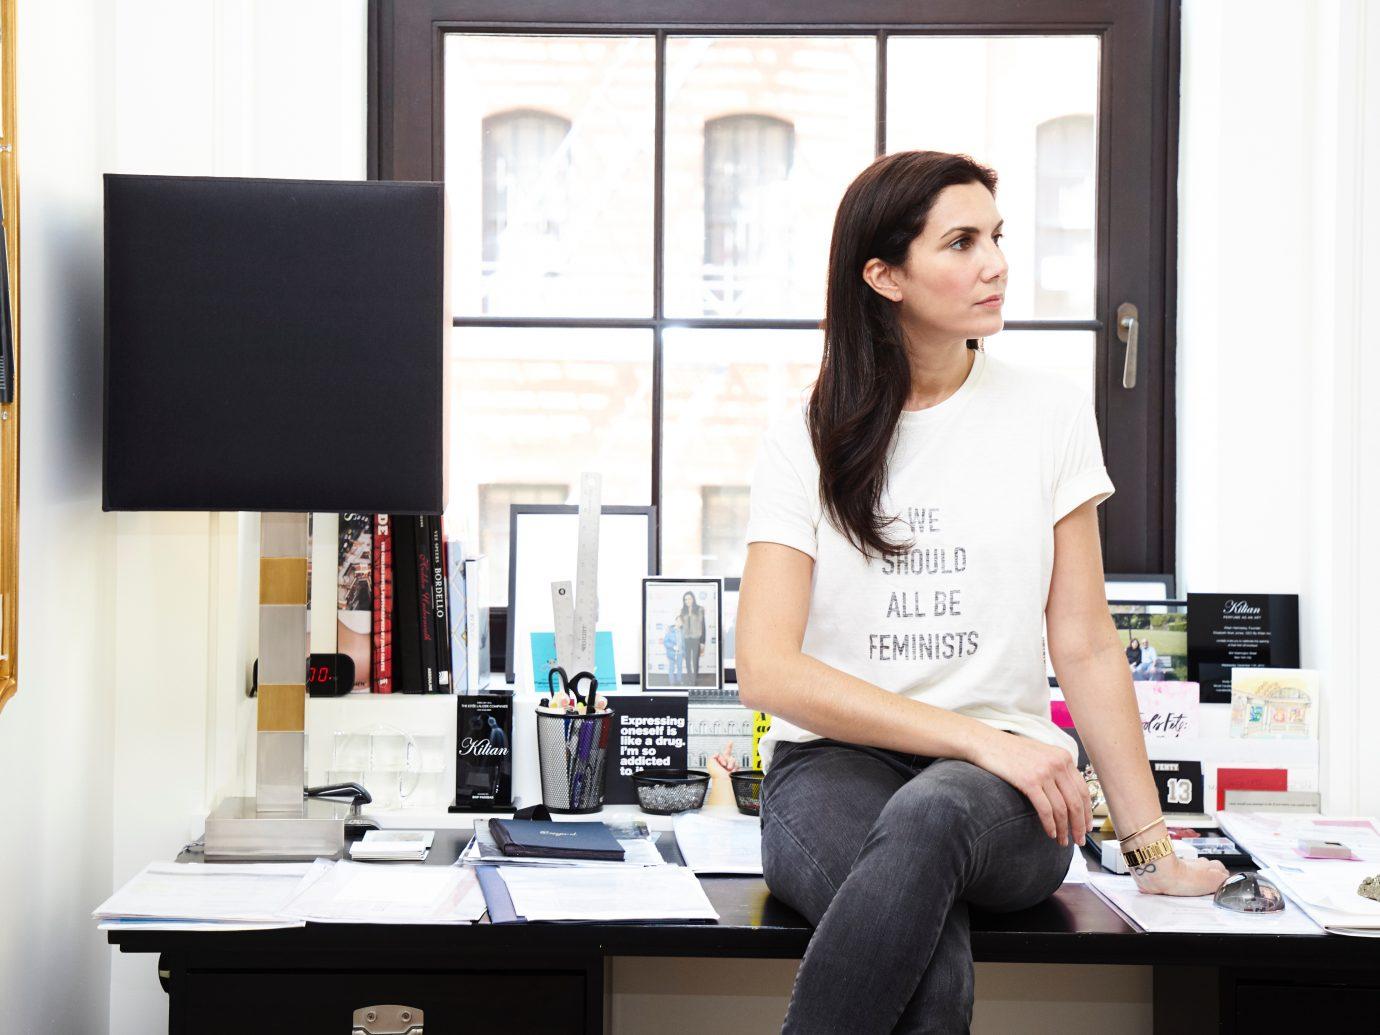 Elisabeth-Jones Hennessy sitting atop her desk in her work space